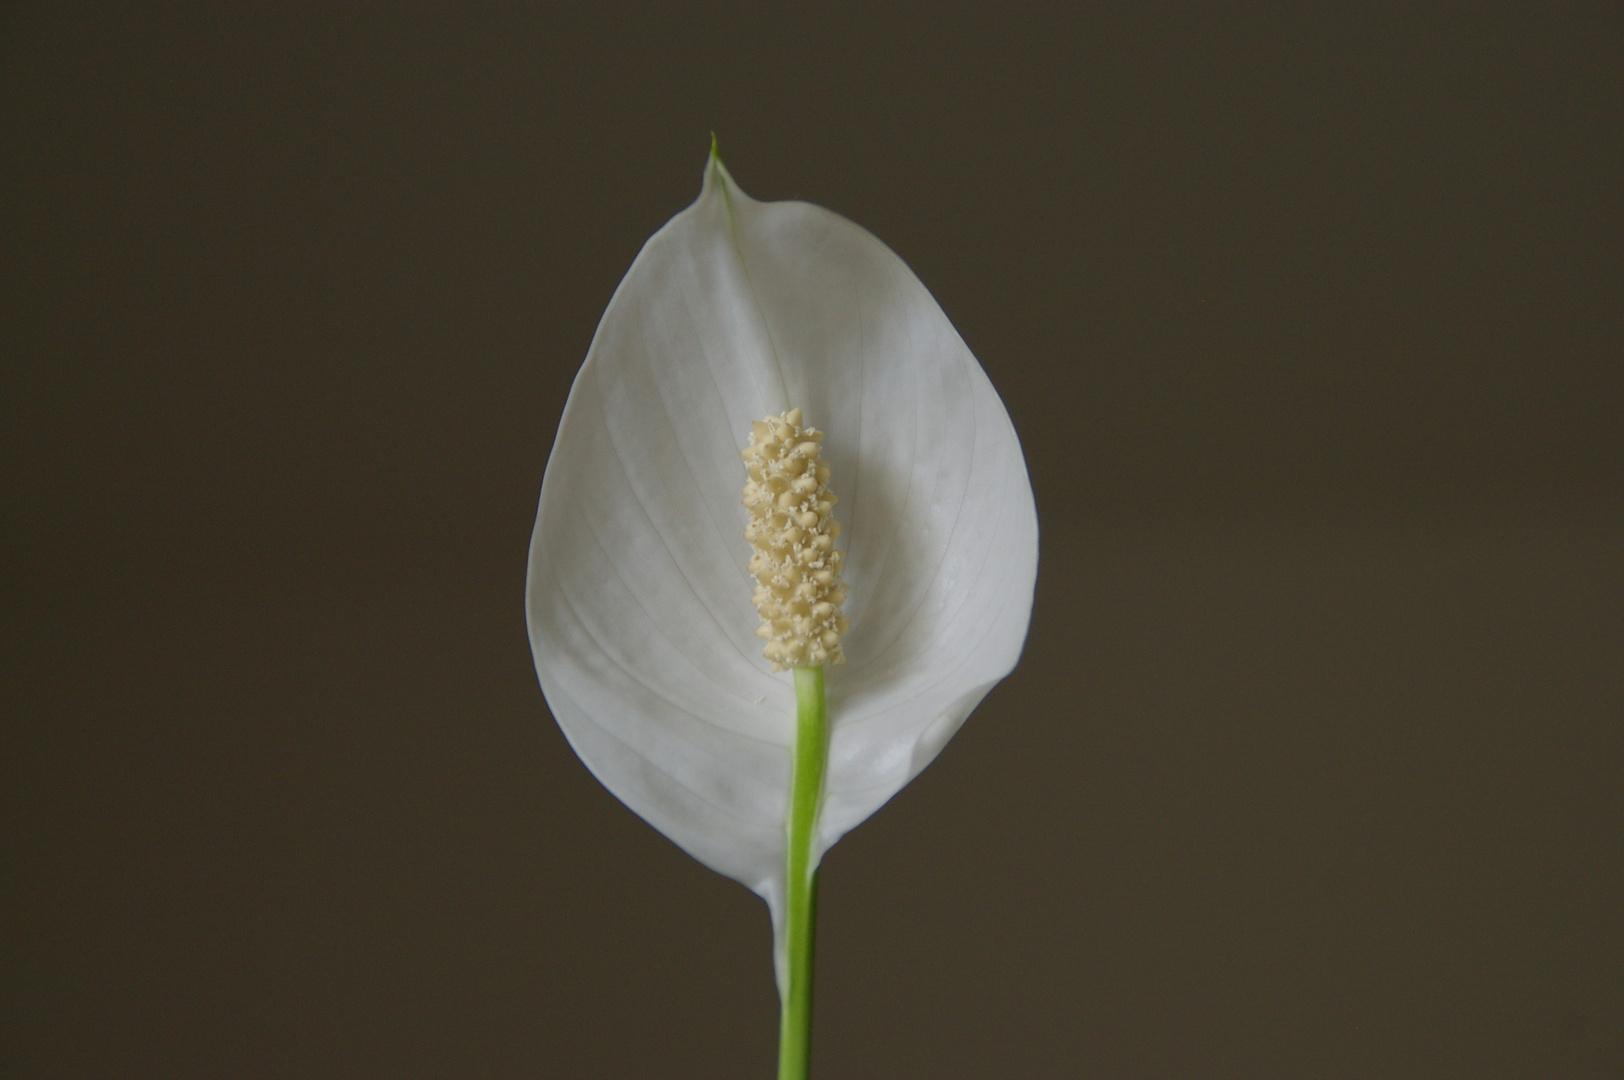 la fleur de ma plante interieur.